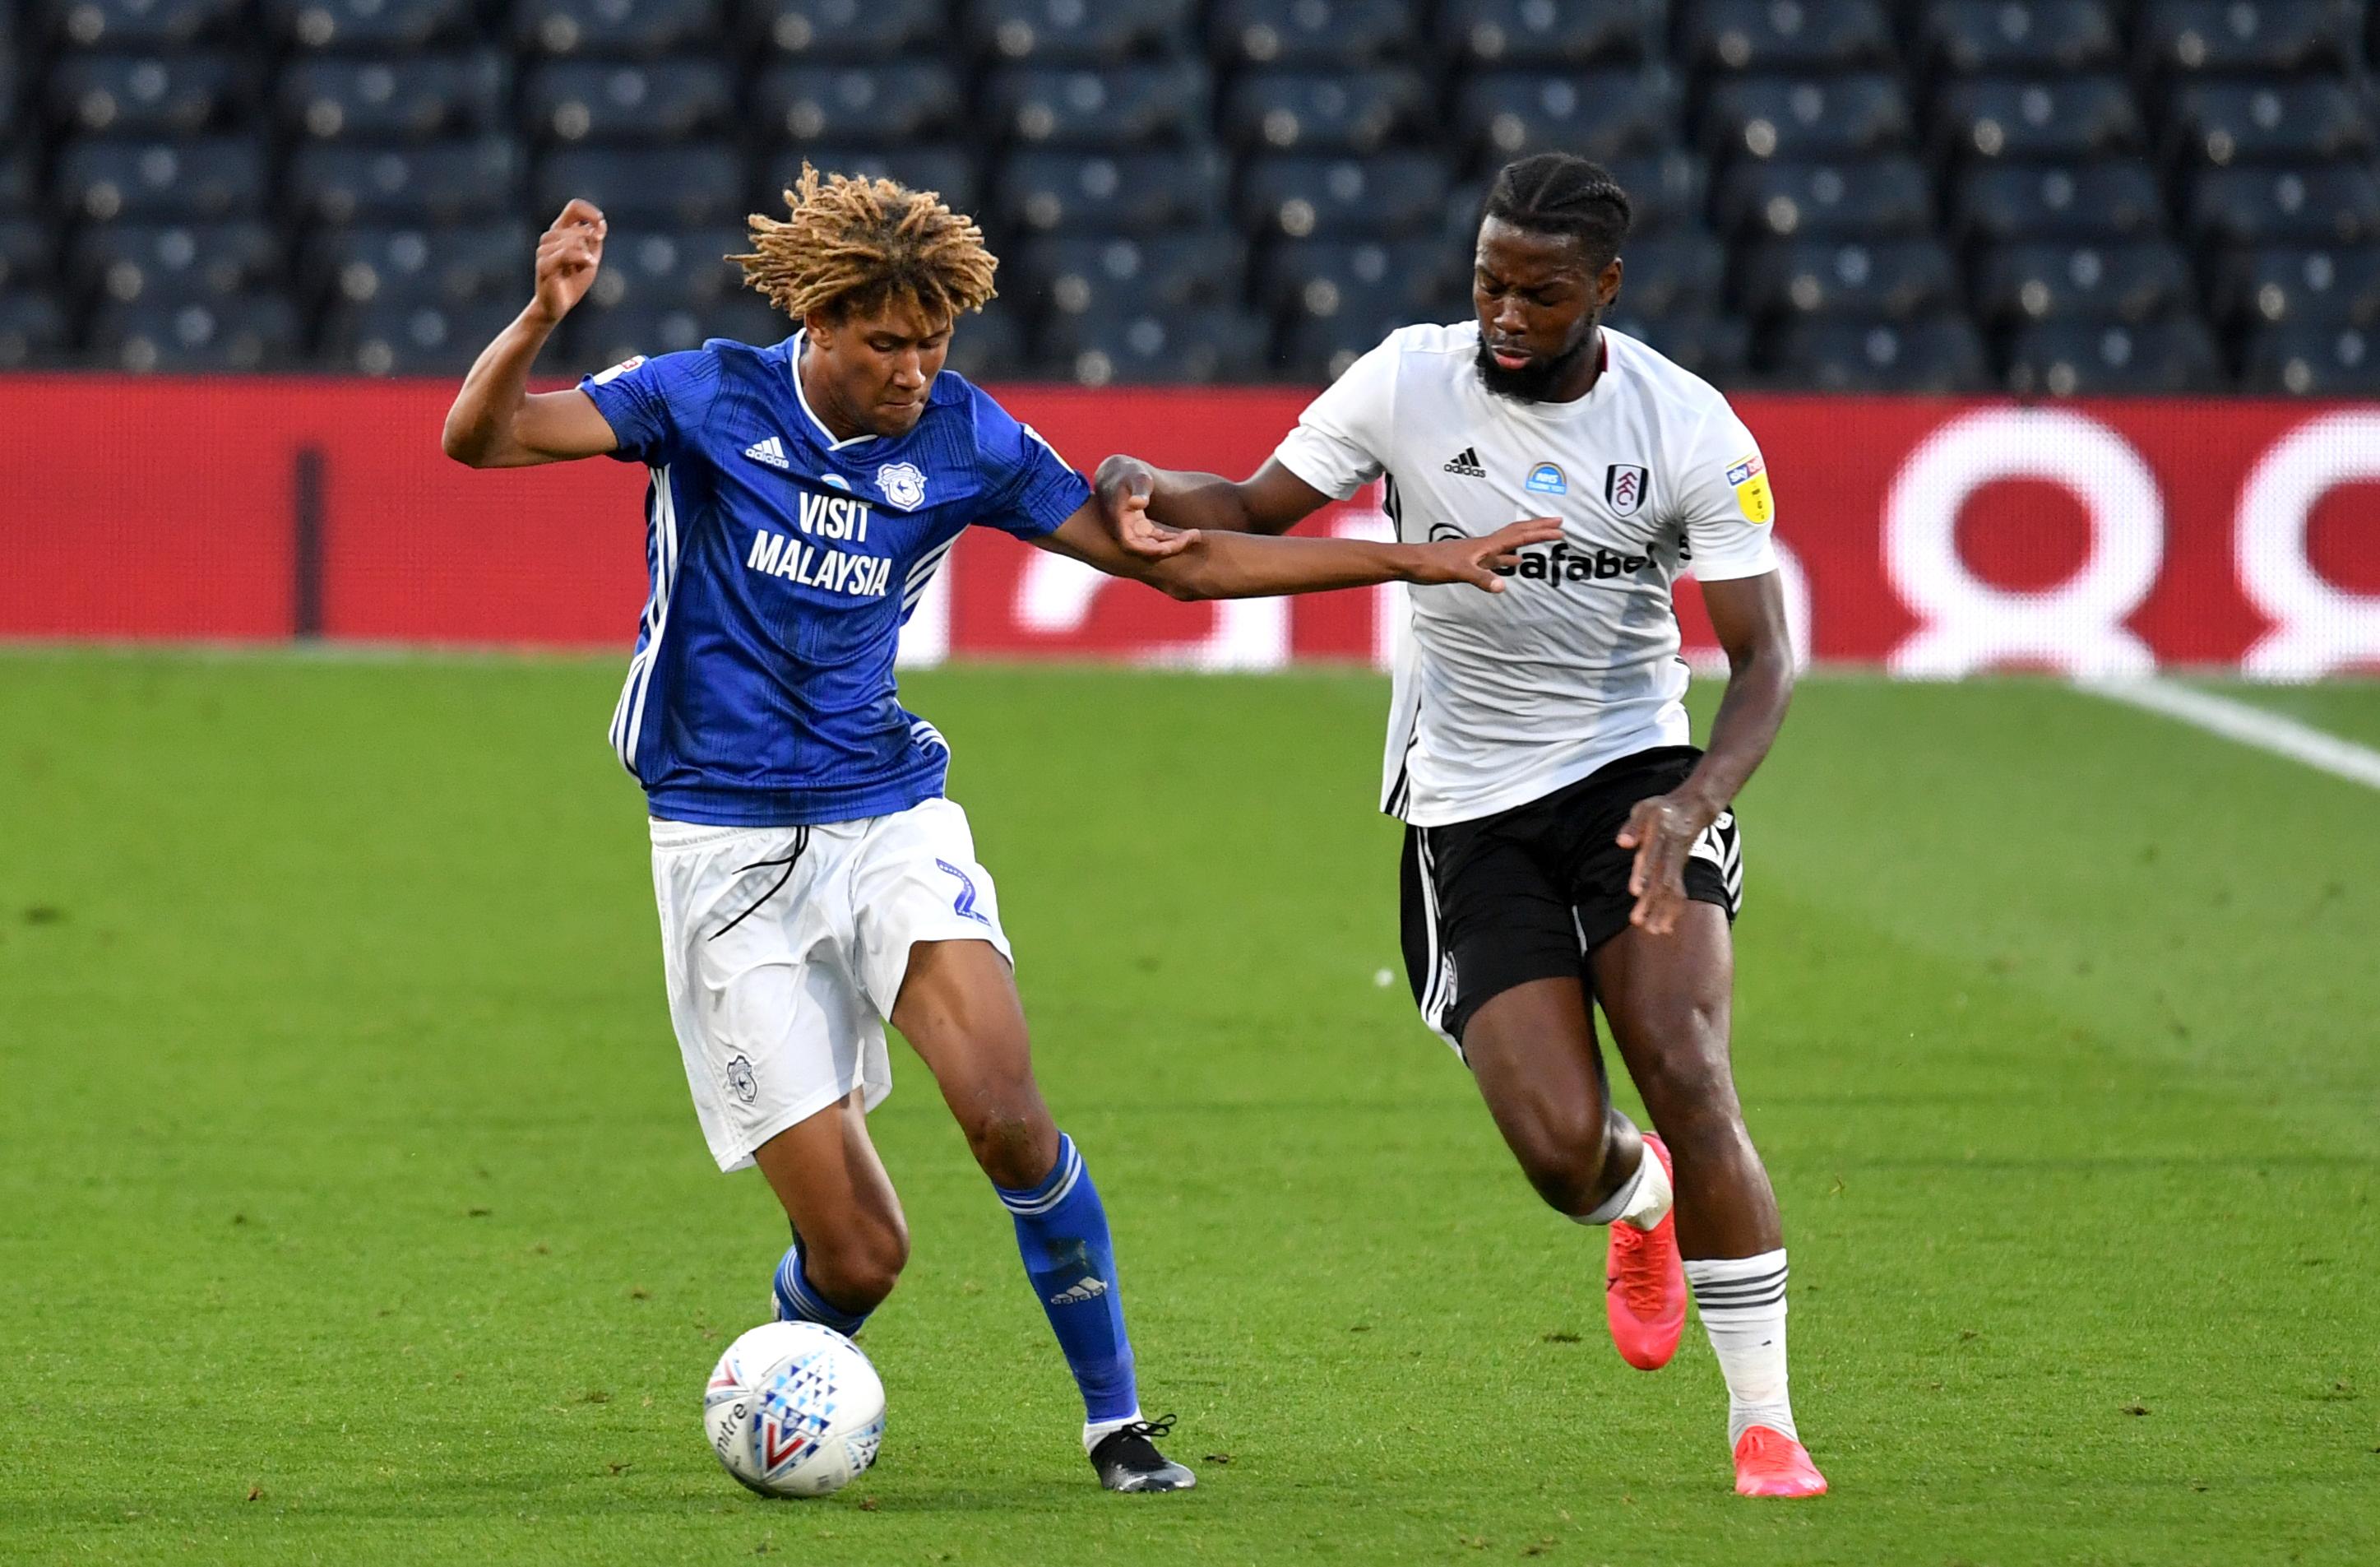 Fulham v Cardiff City - Sky Bet Championship - Craven Cottage